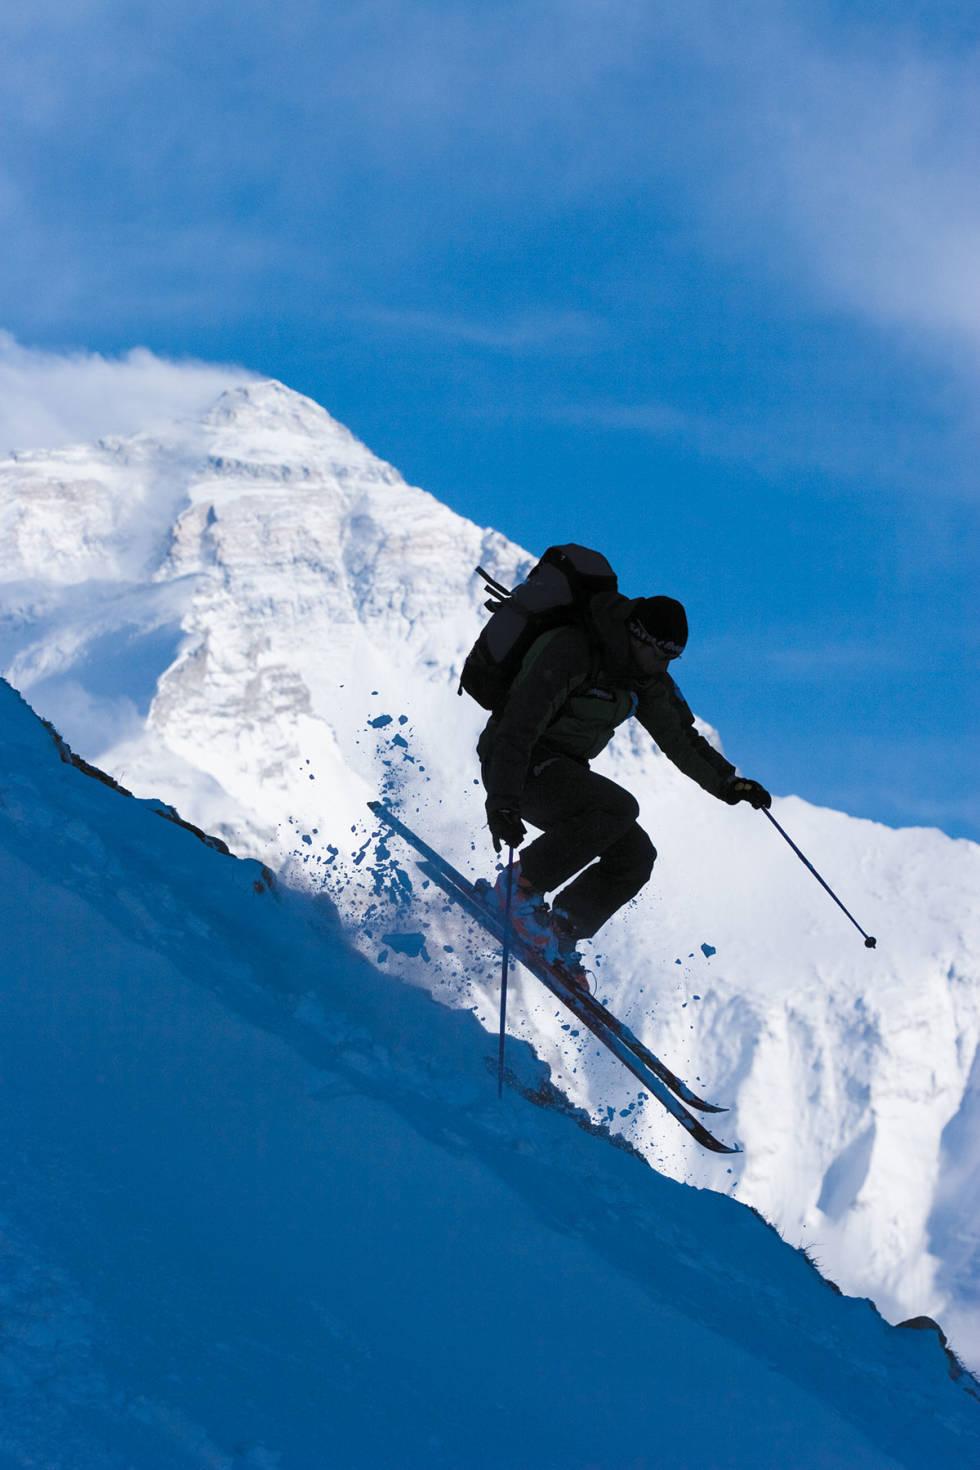 Tomas Olsson Mount Everest